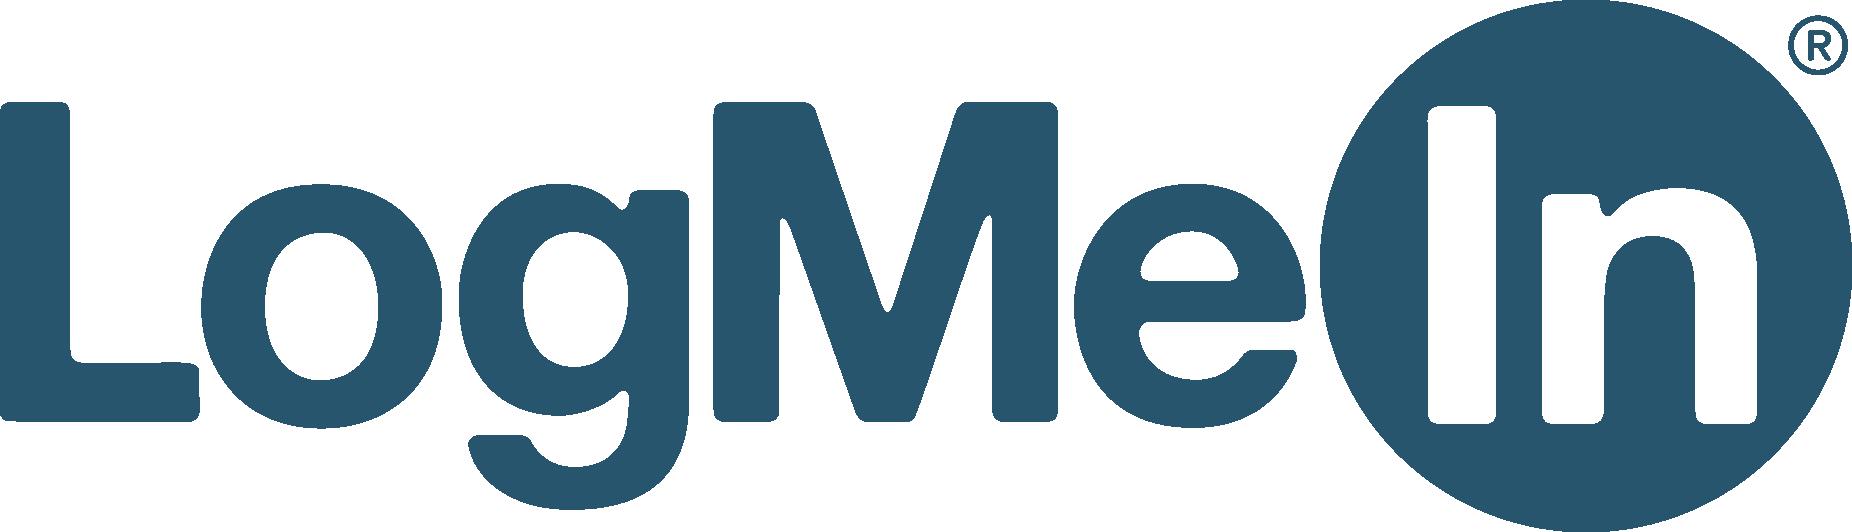 LogMeIn USA